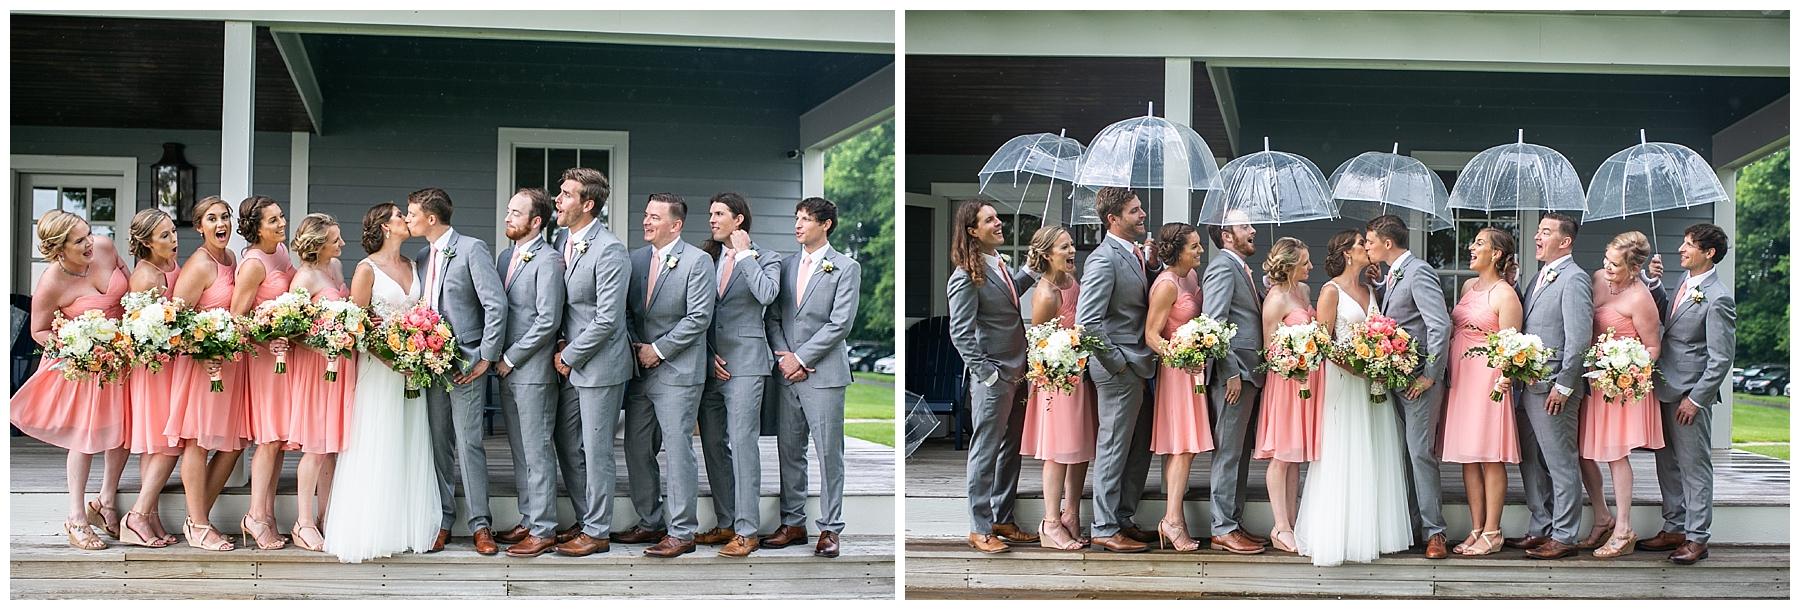 Chelsea Phil Bohemia River Overlook Wedding Living Radiant Photography photos_0079.jpg